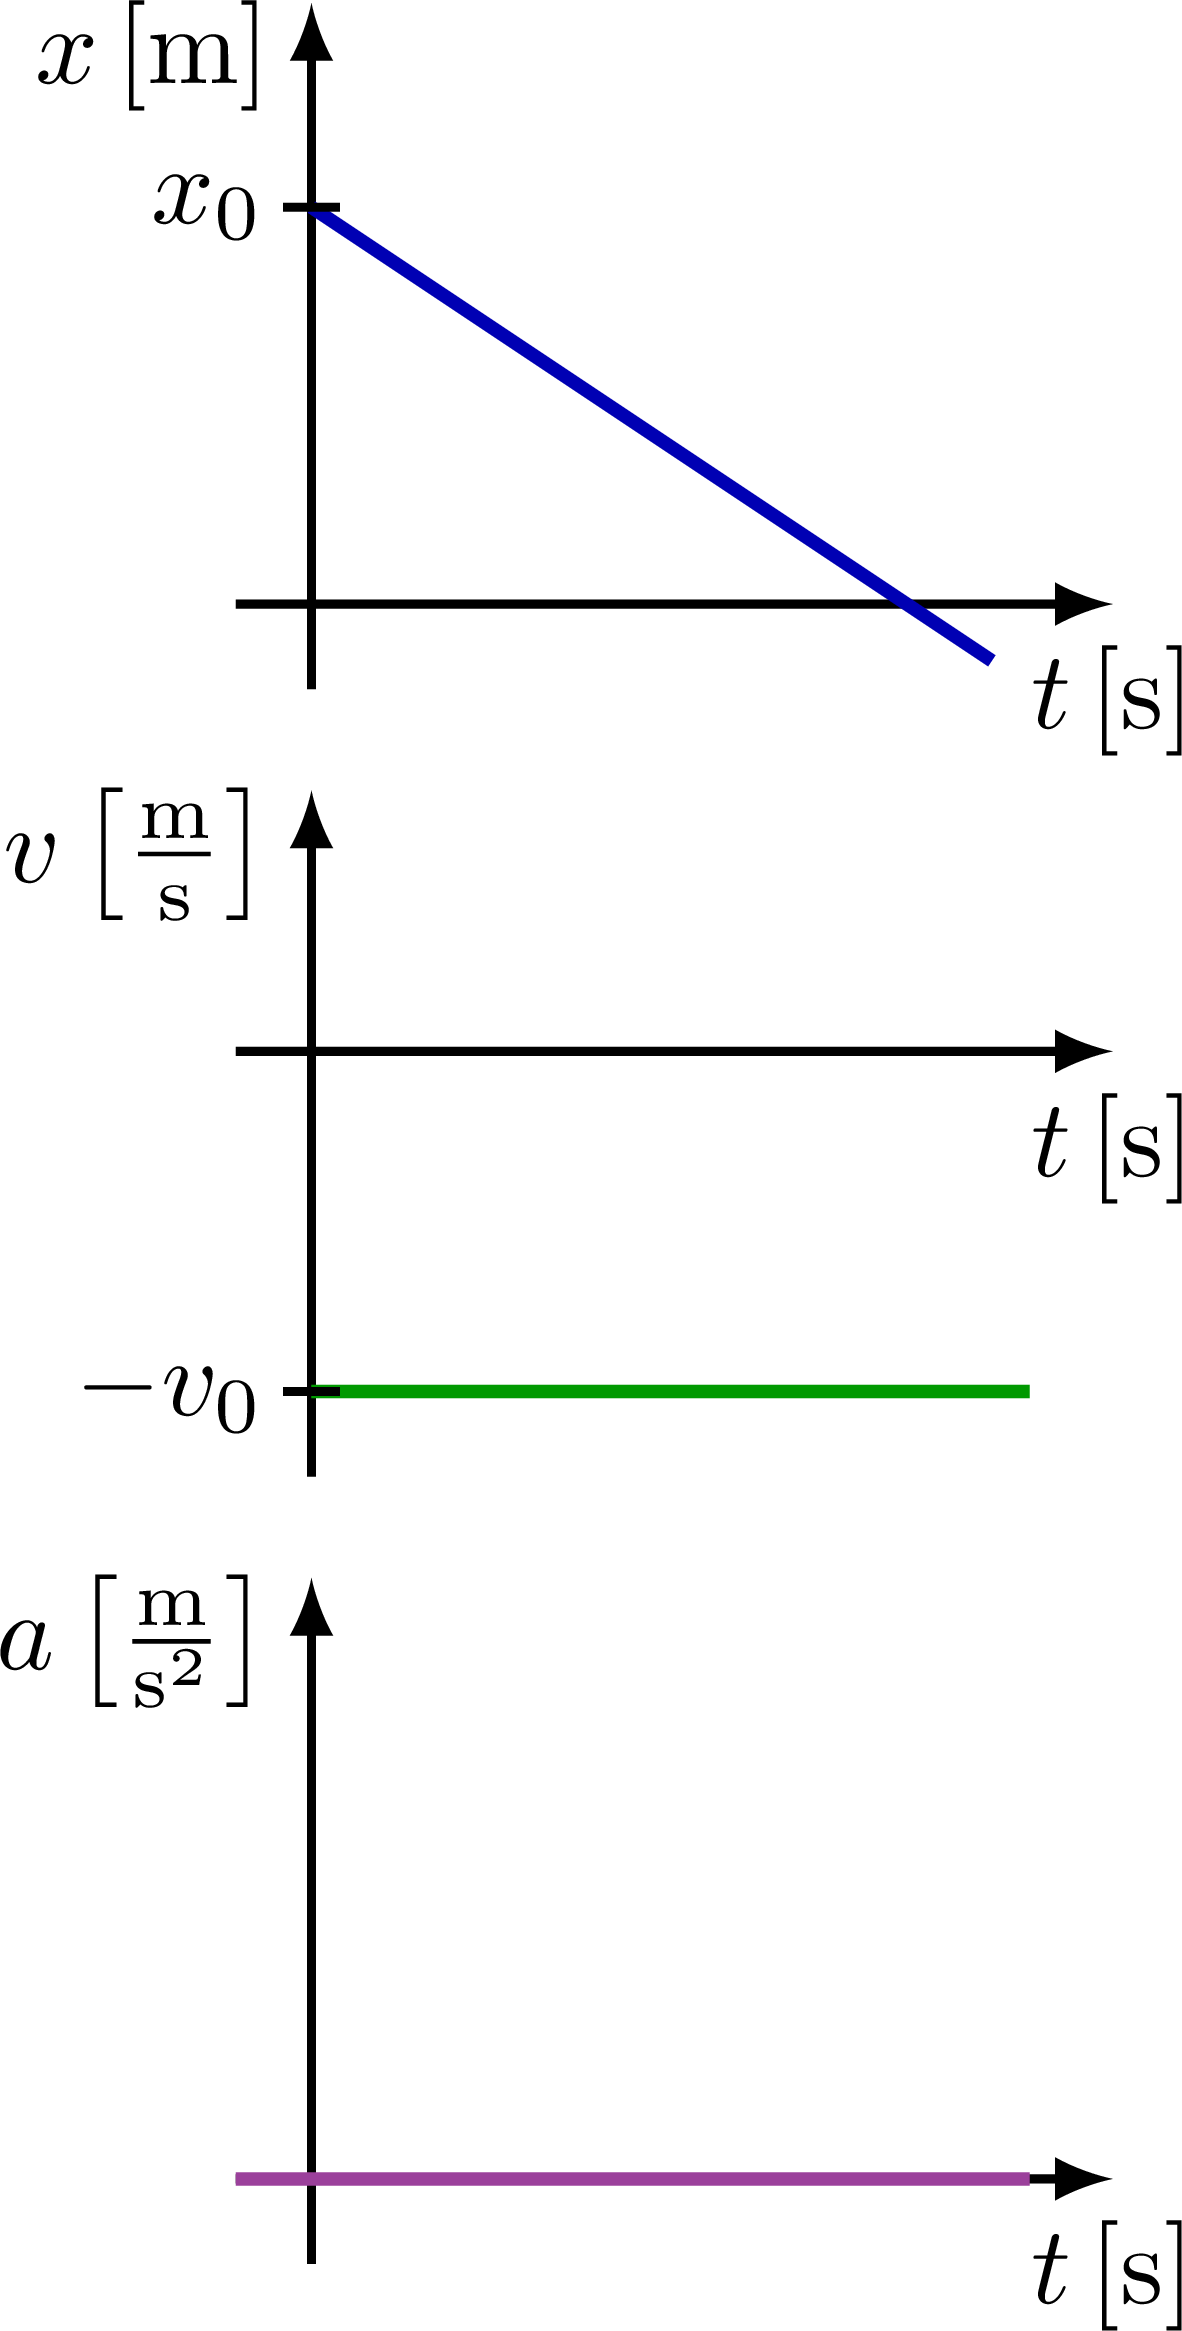 kinematics_curves_xva-003.png